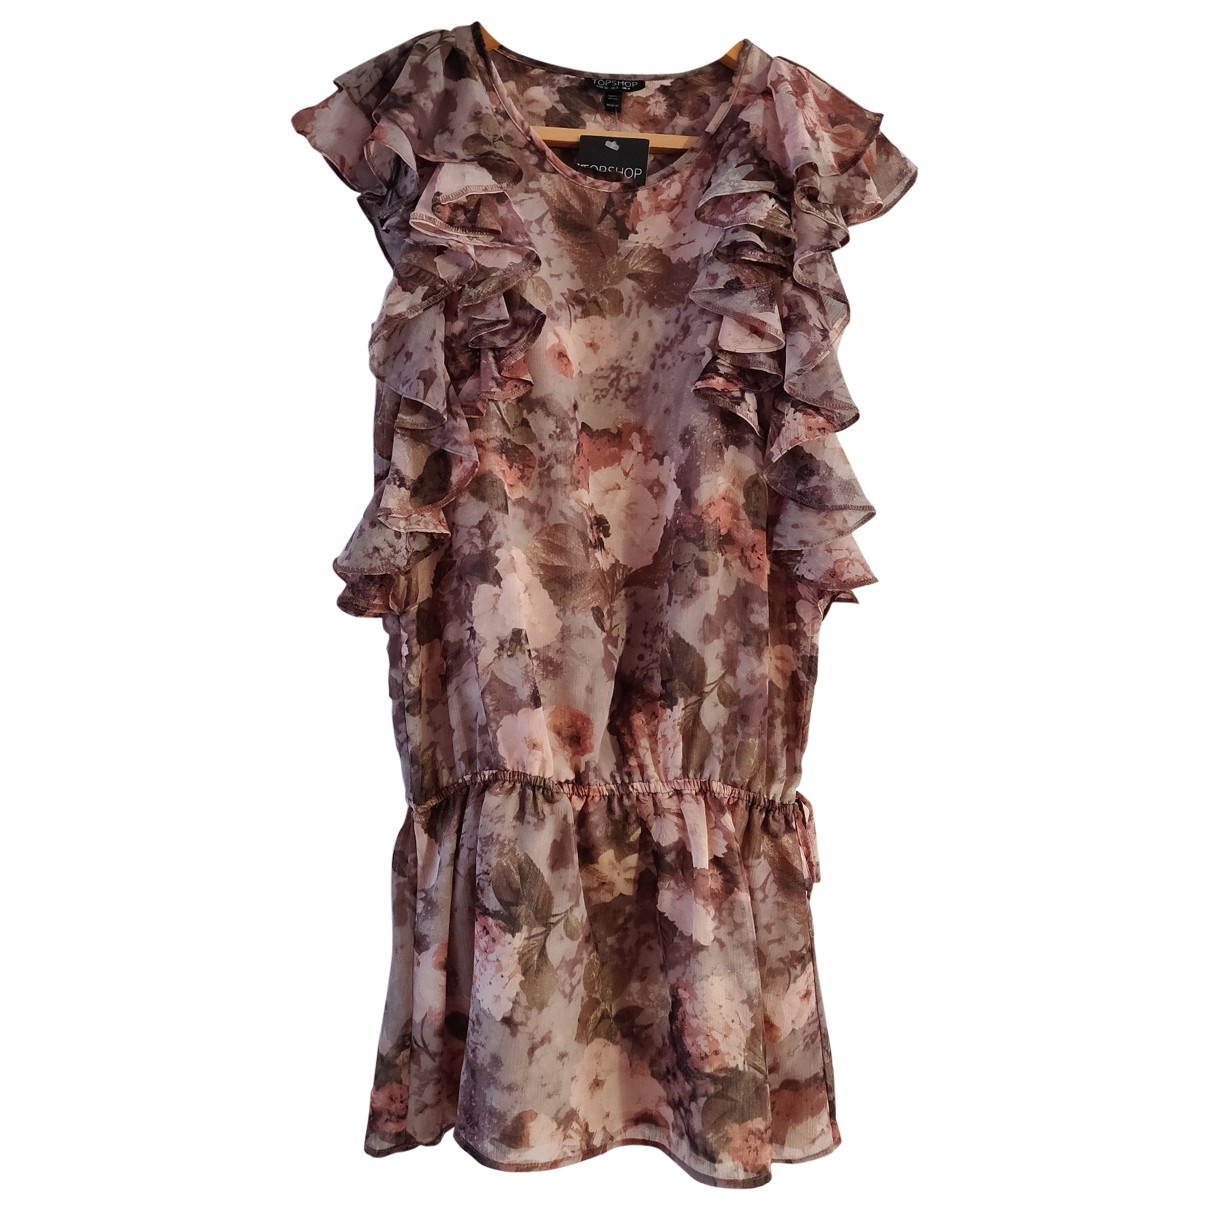 tophop \N Multicolour dress for Women 36 FR